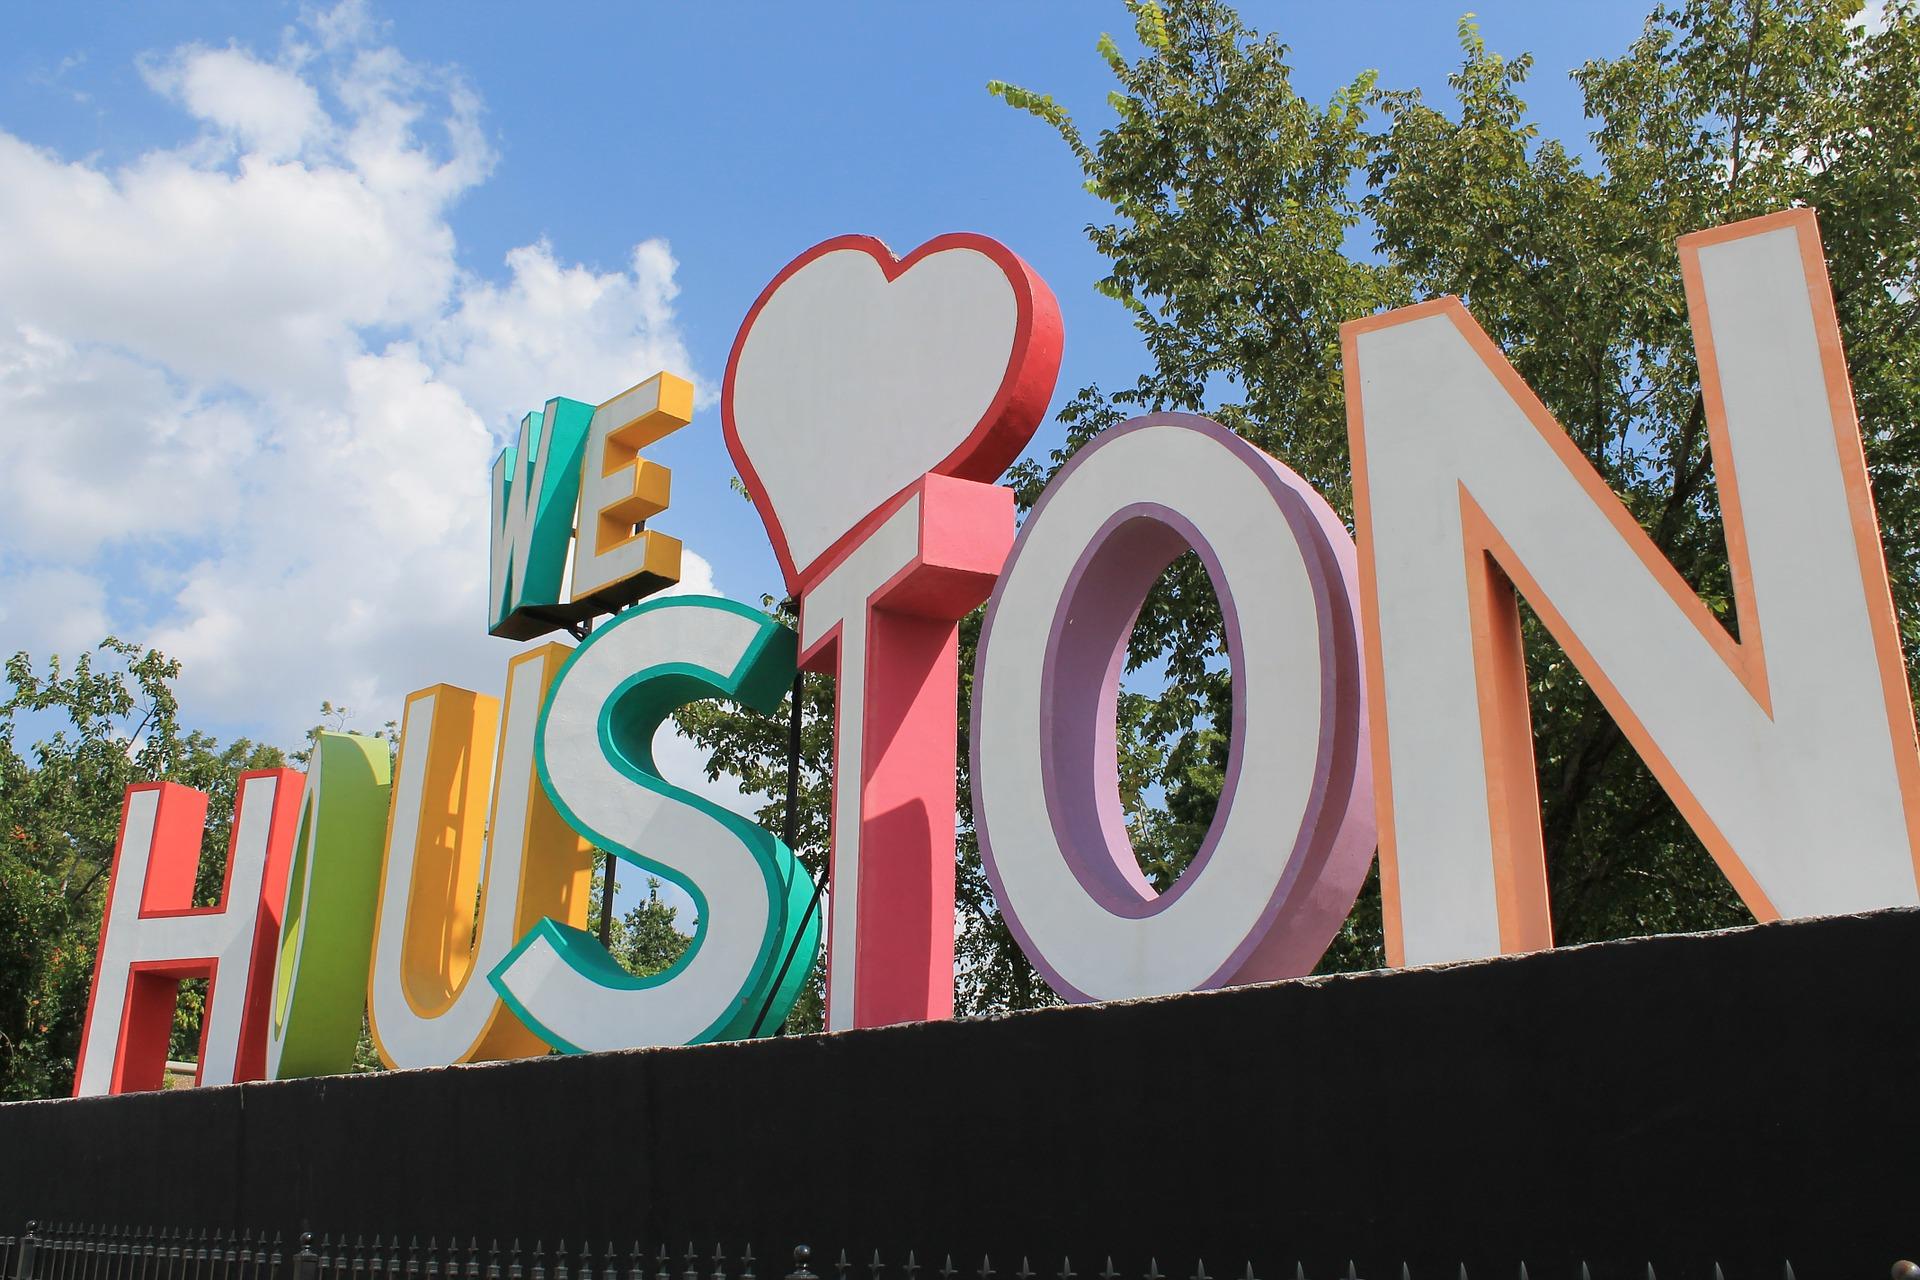 Houston Resume Writing Service: Call (832) 736 0585